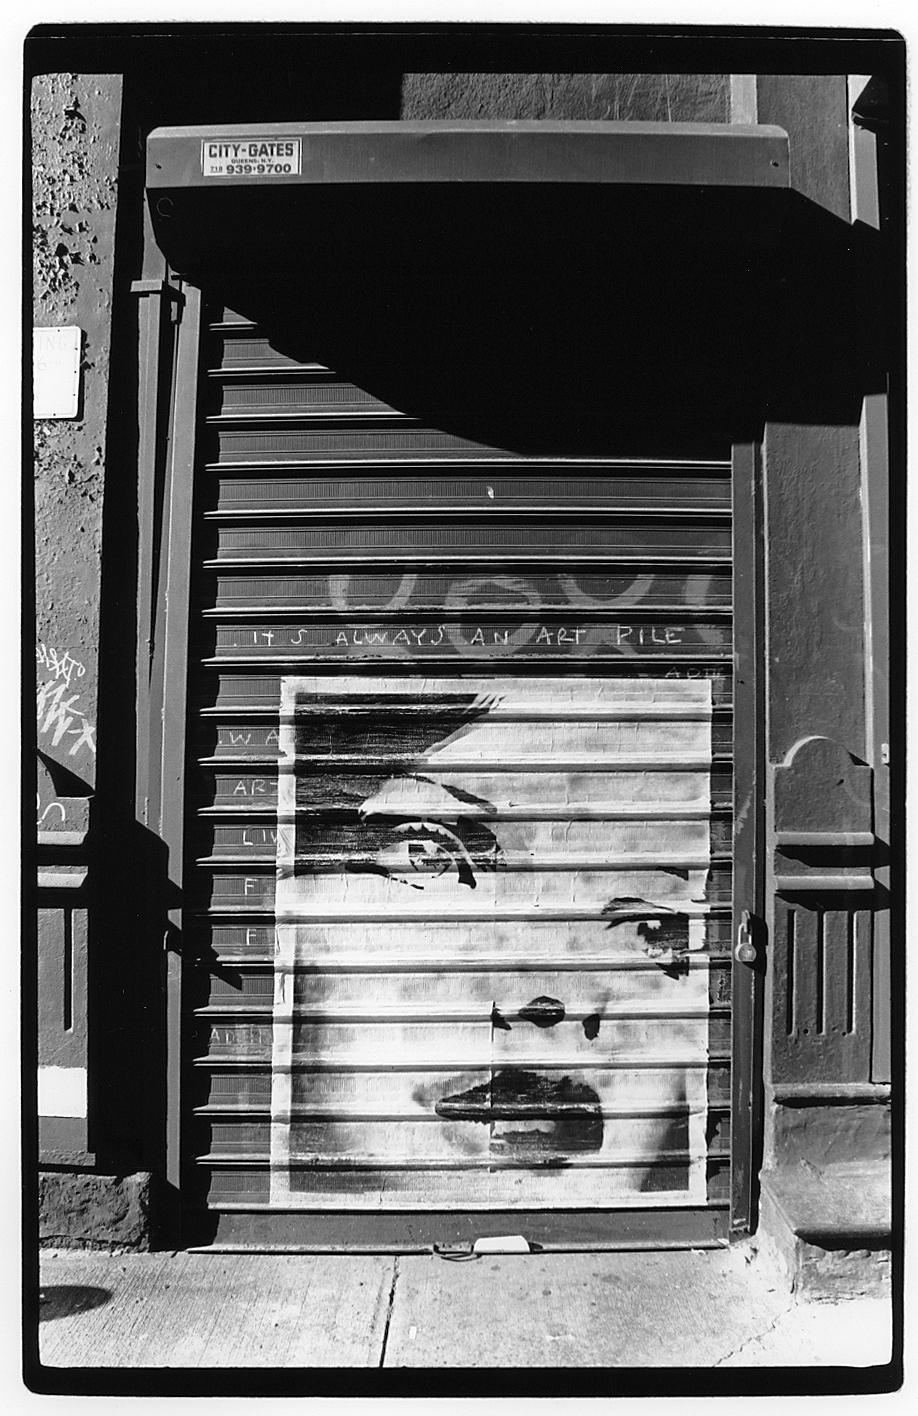 New York, 2002